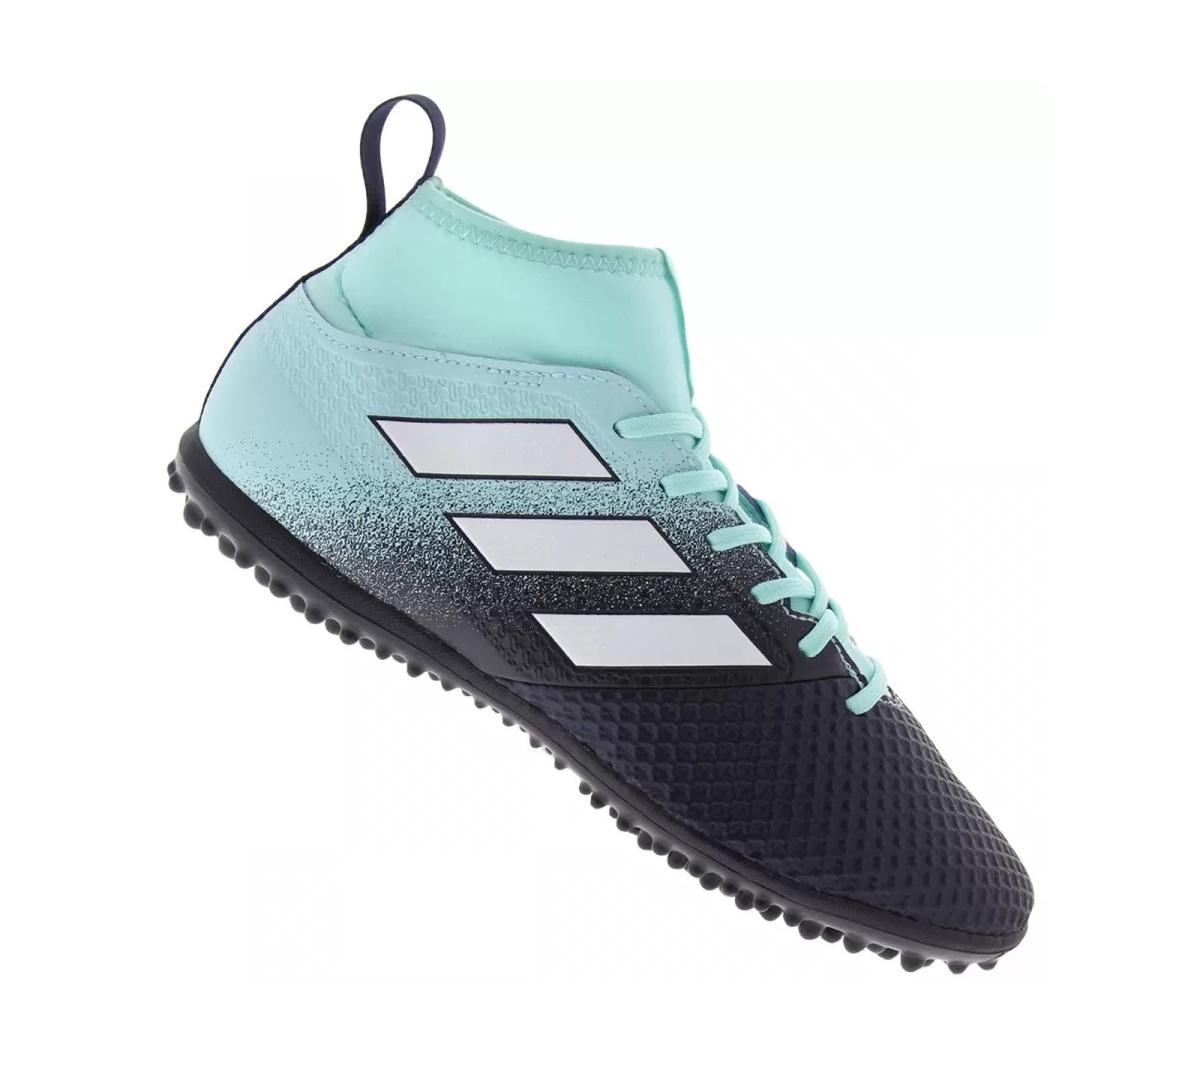 Chuteira Adidas Ace Tango 17.3 Society